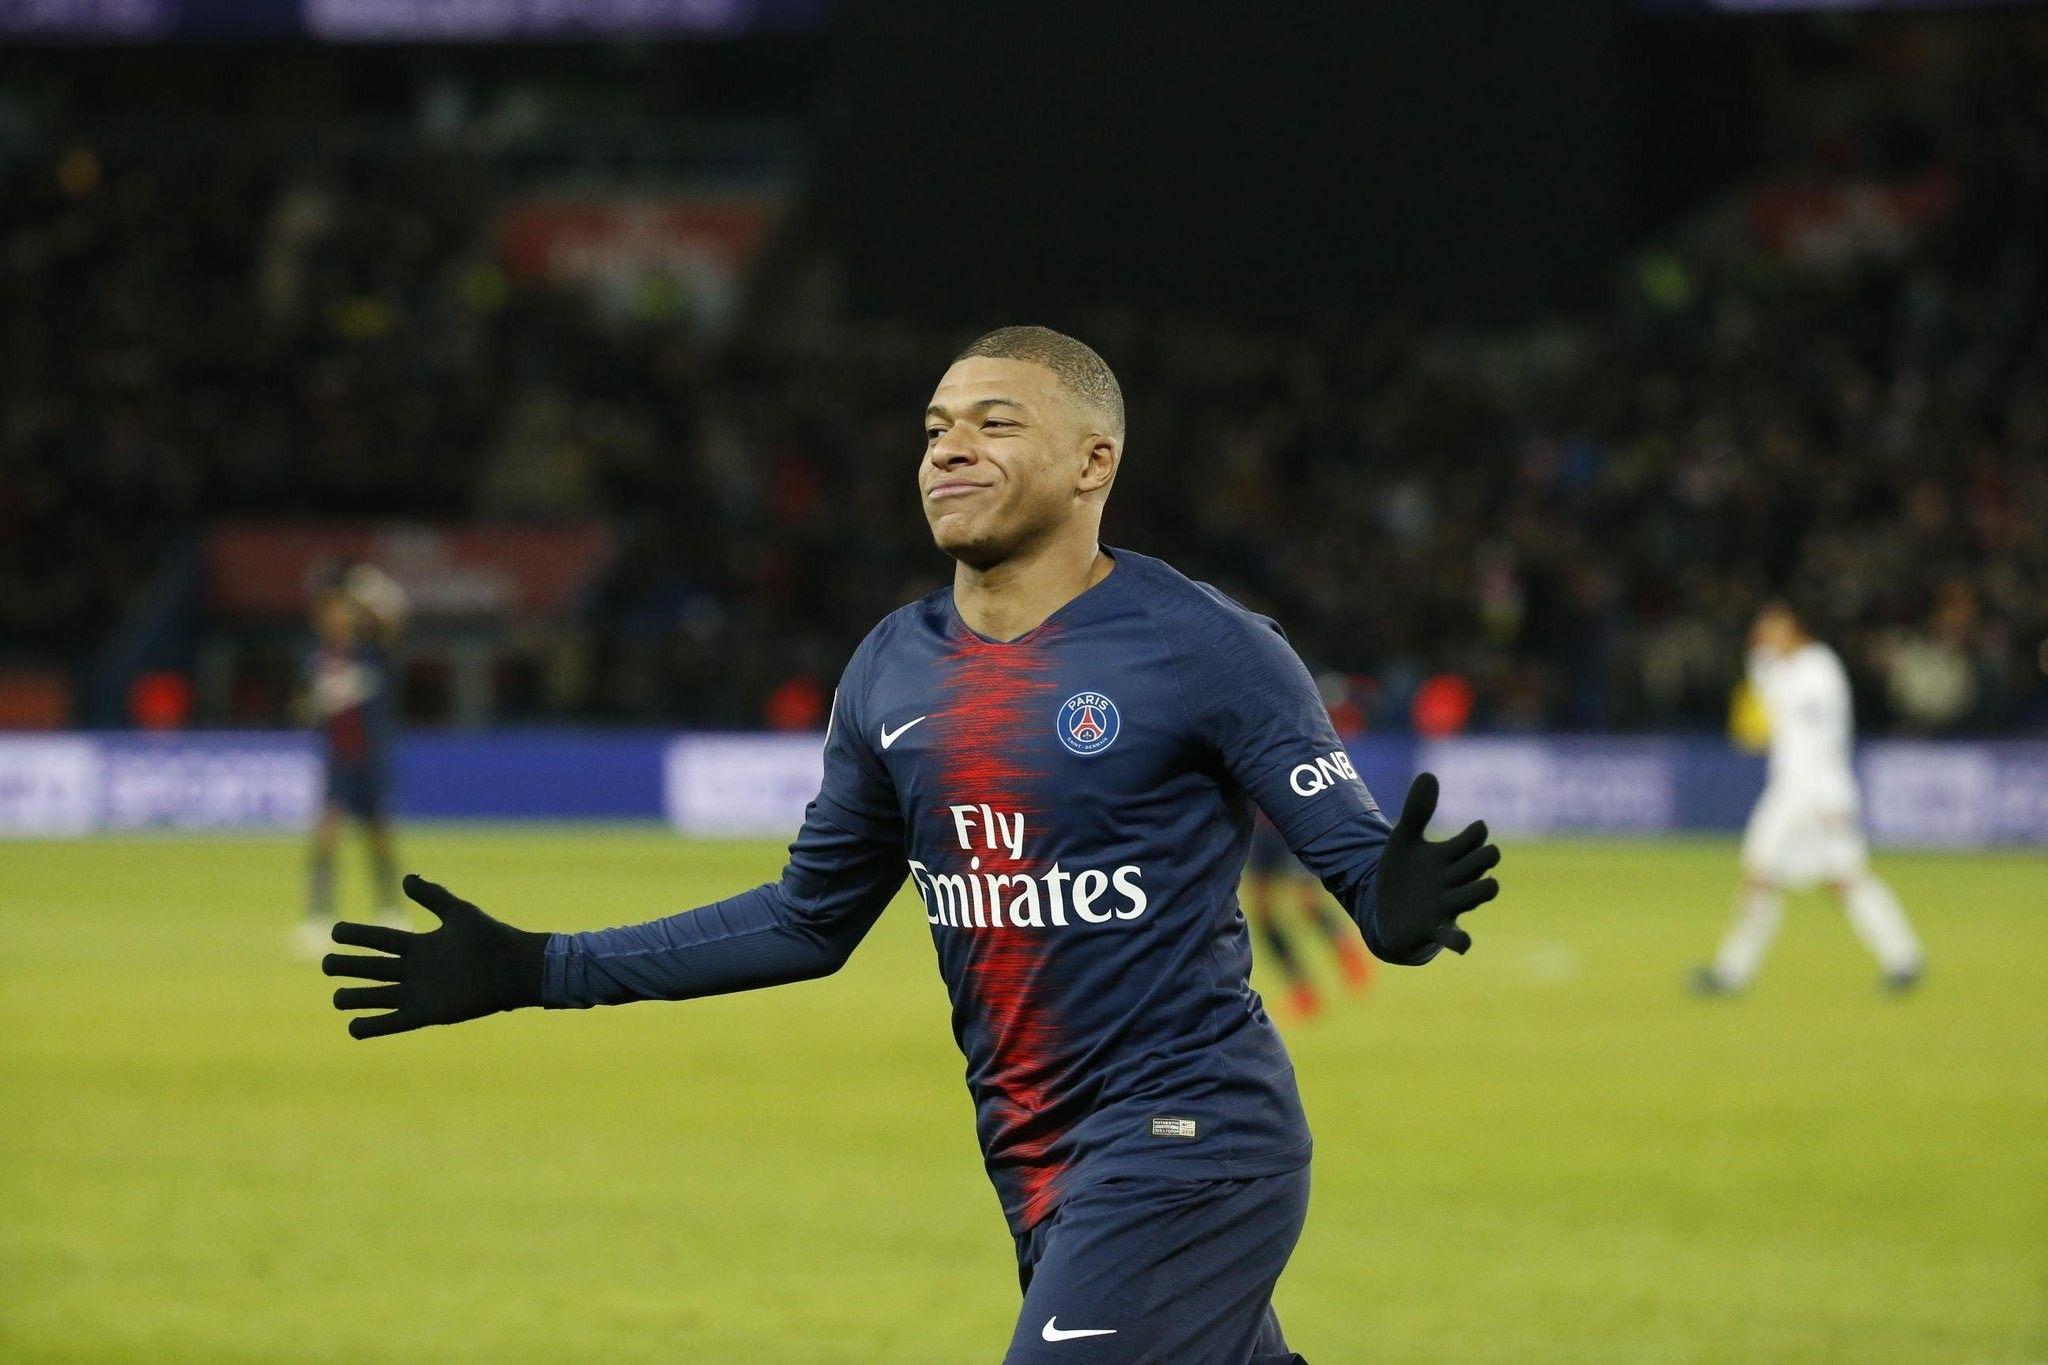 Épinglé par Kiana sur ️Kylian Mbappe ️ Footballeur, As